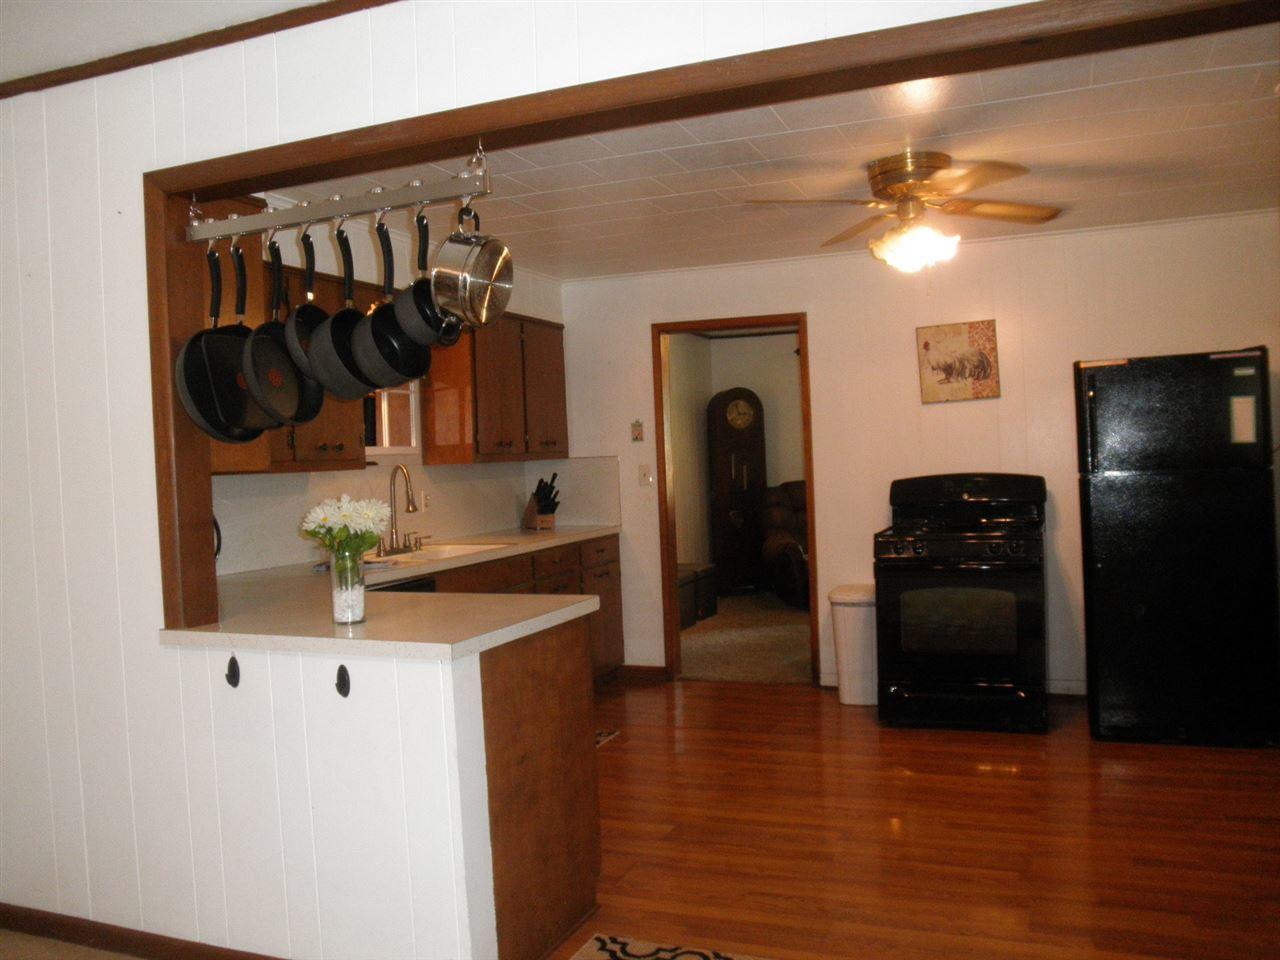 Sold Cross Sale W/ MLS | 808 Gray  Ponca City, OK 74604 4